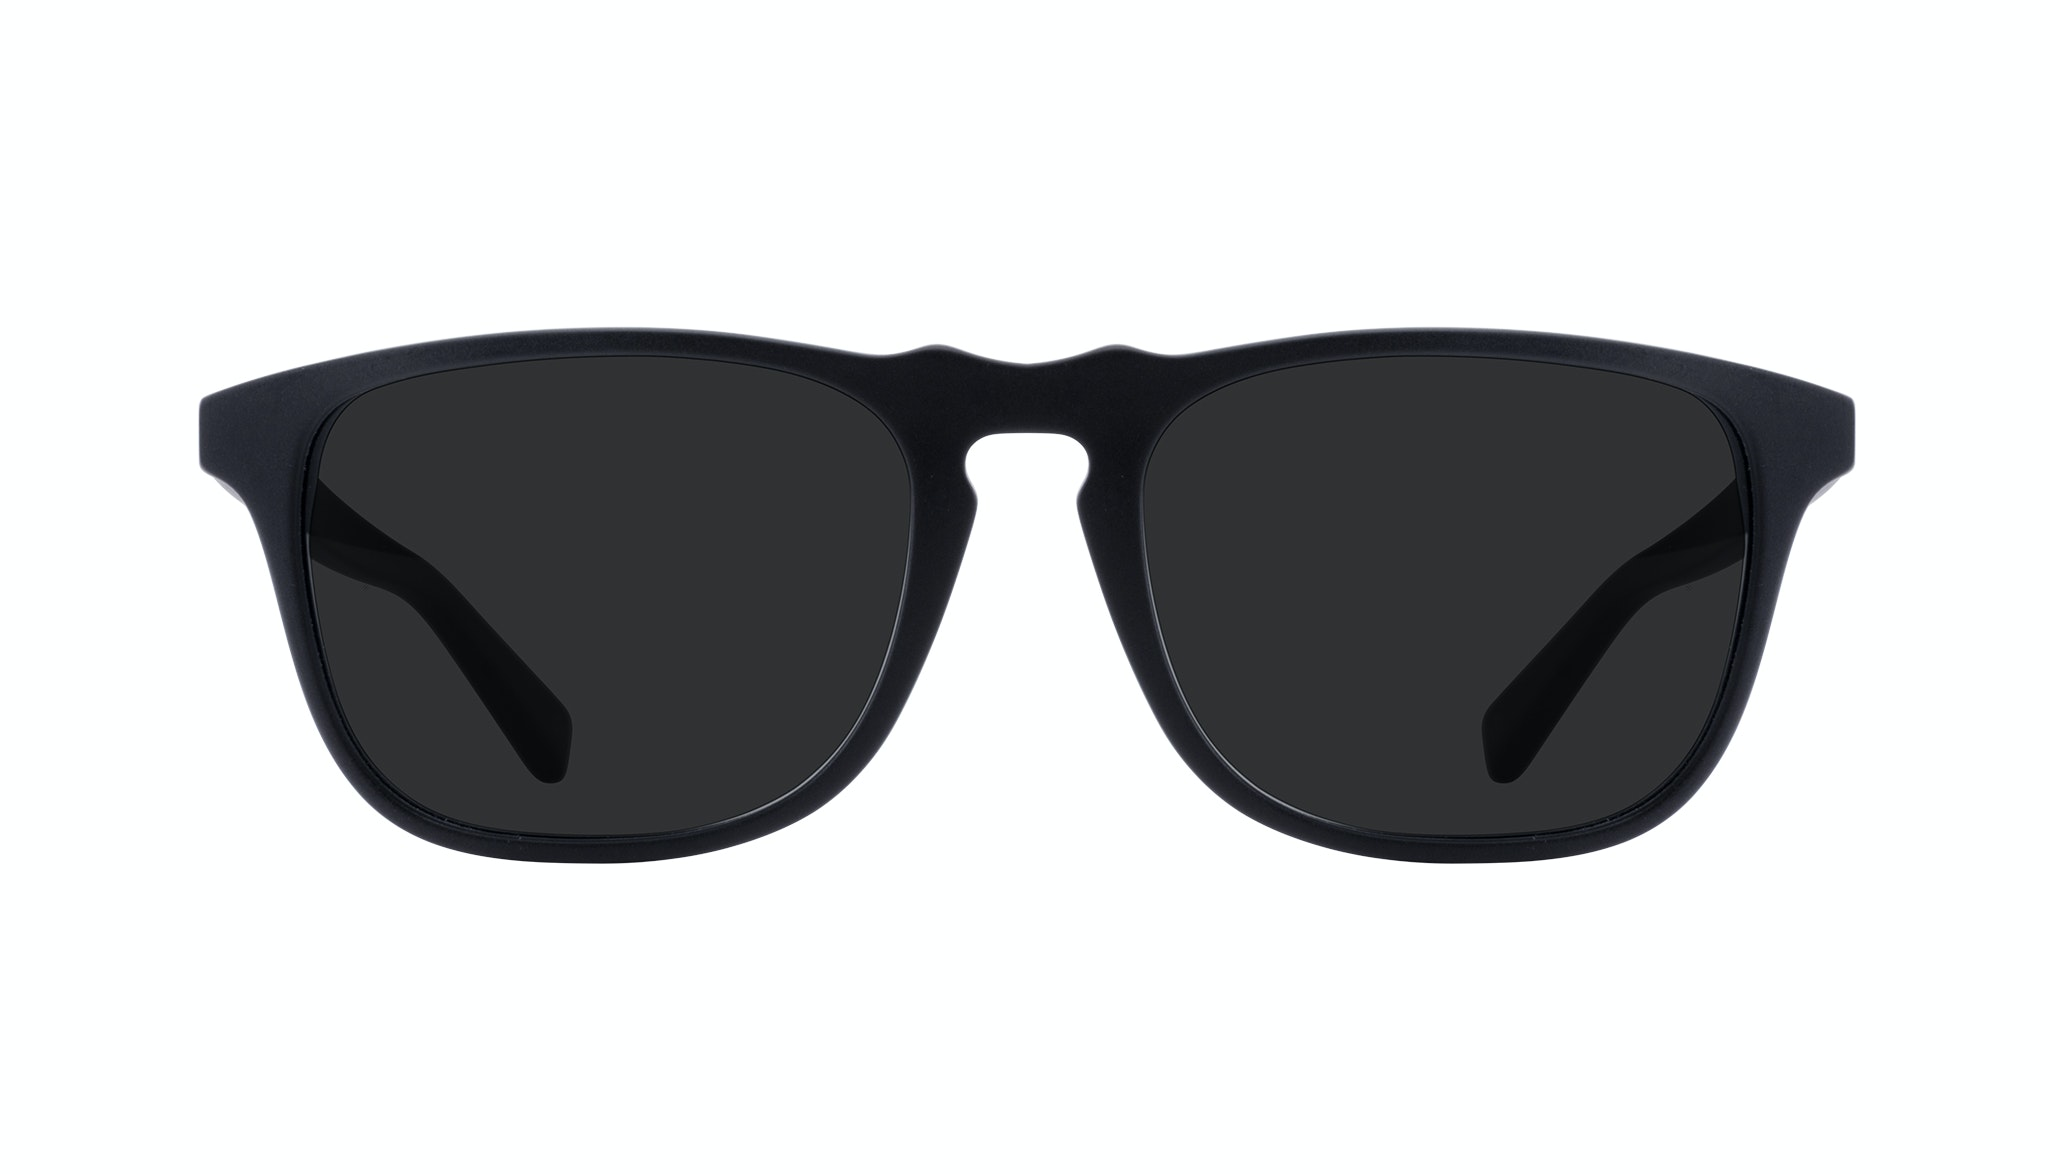 Affordable Fashion Glasses Rectangle Sunglasses Men Dare Matte Black